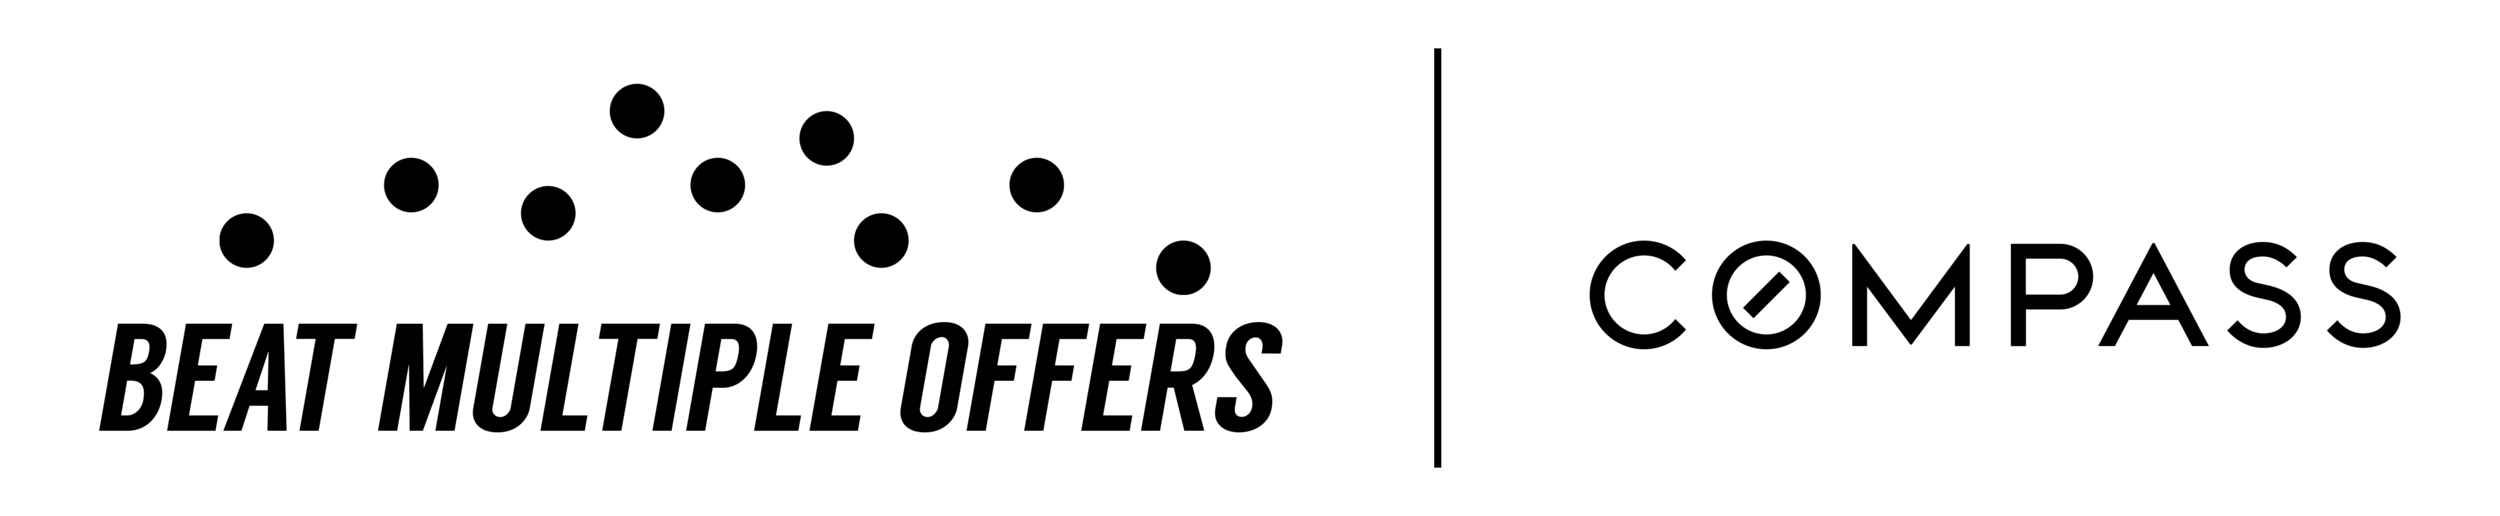 logo2019black2.png